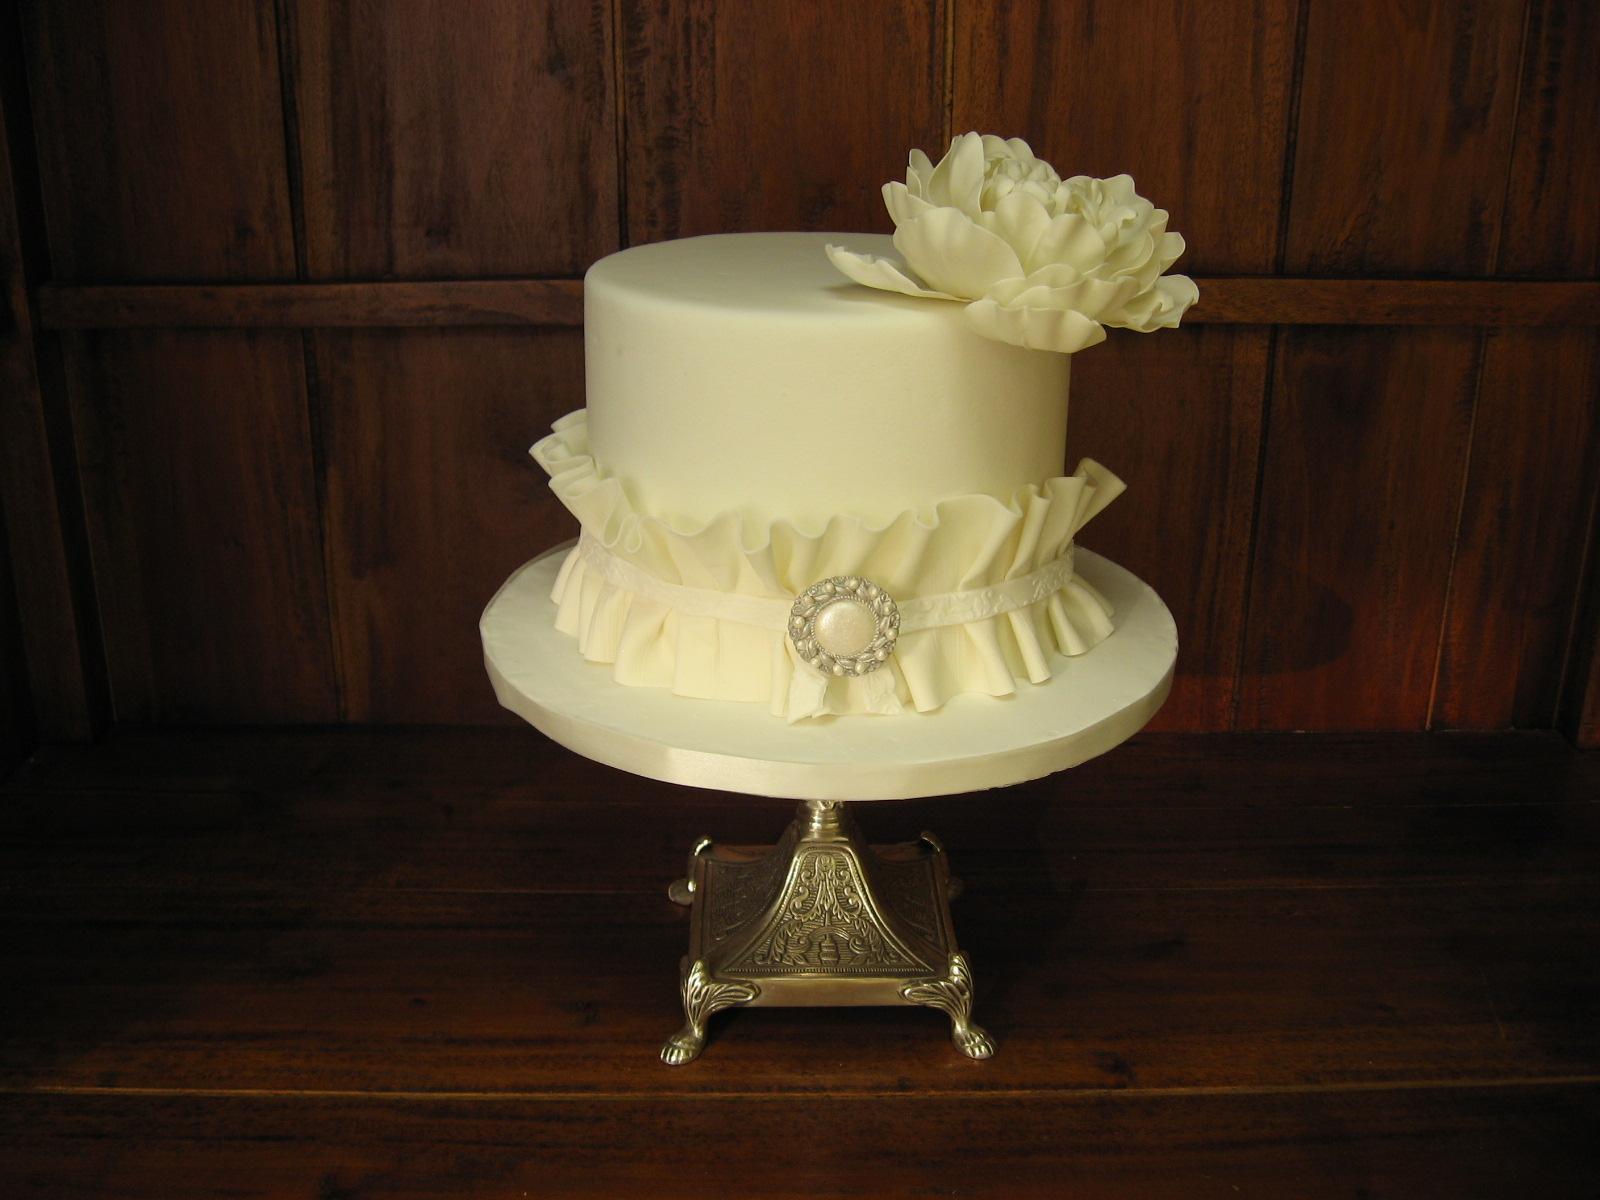 My Weblog/Sugar Seminars: Around the Shop - Savannah Wedding Cakes